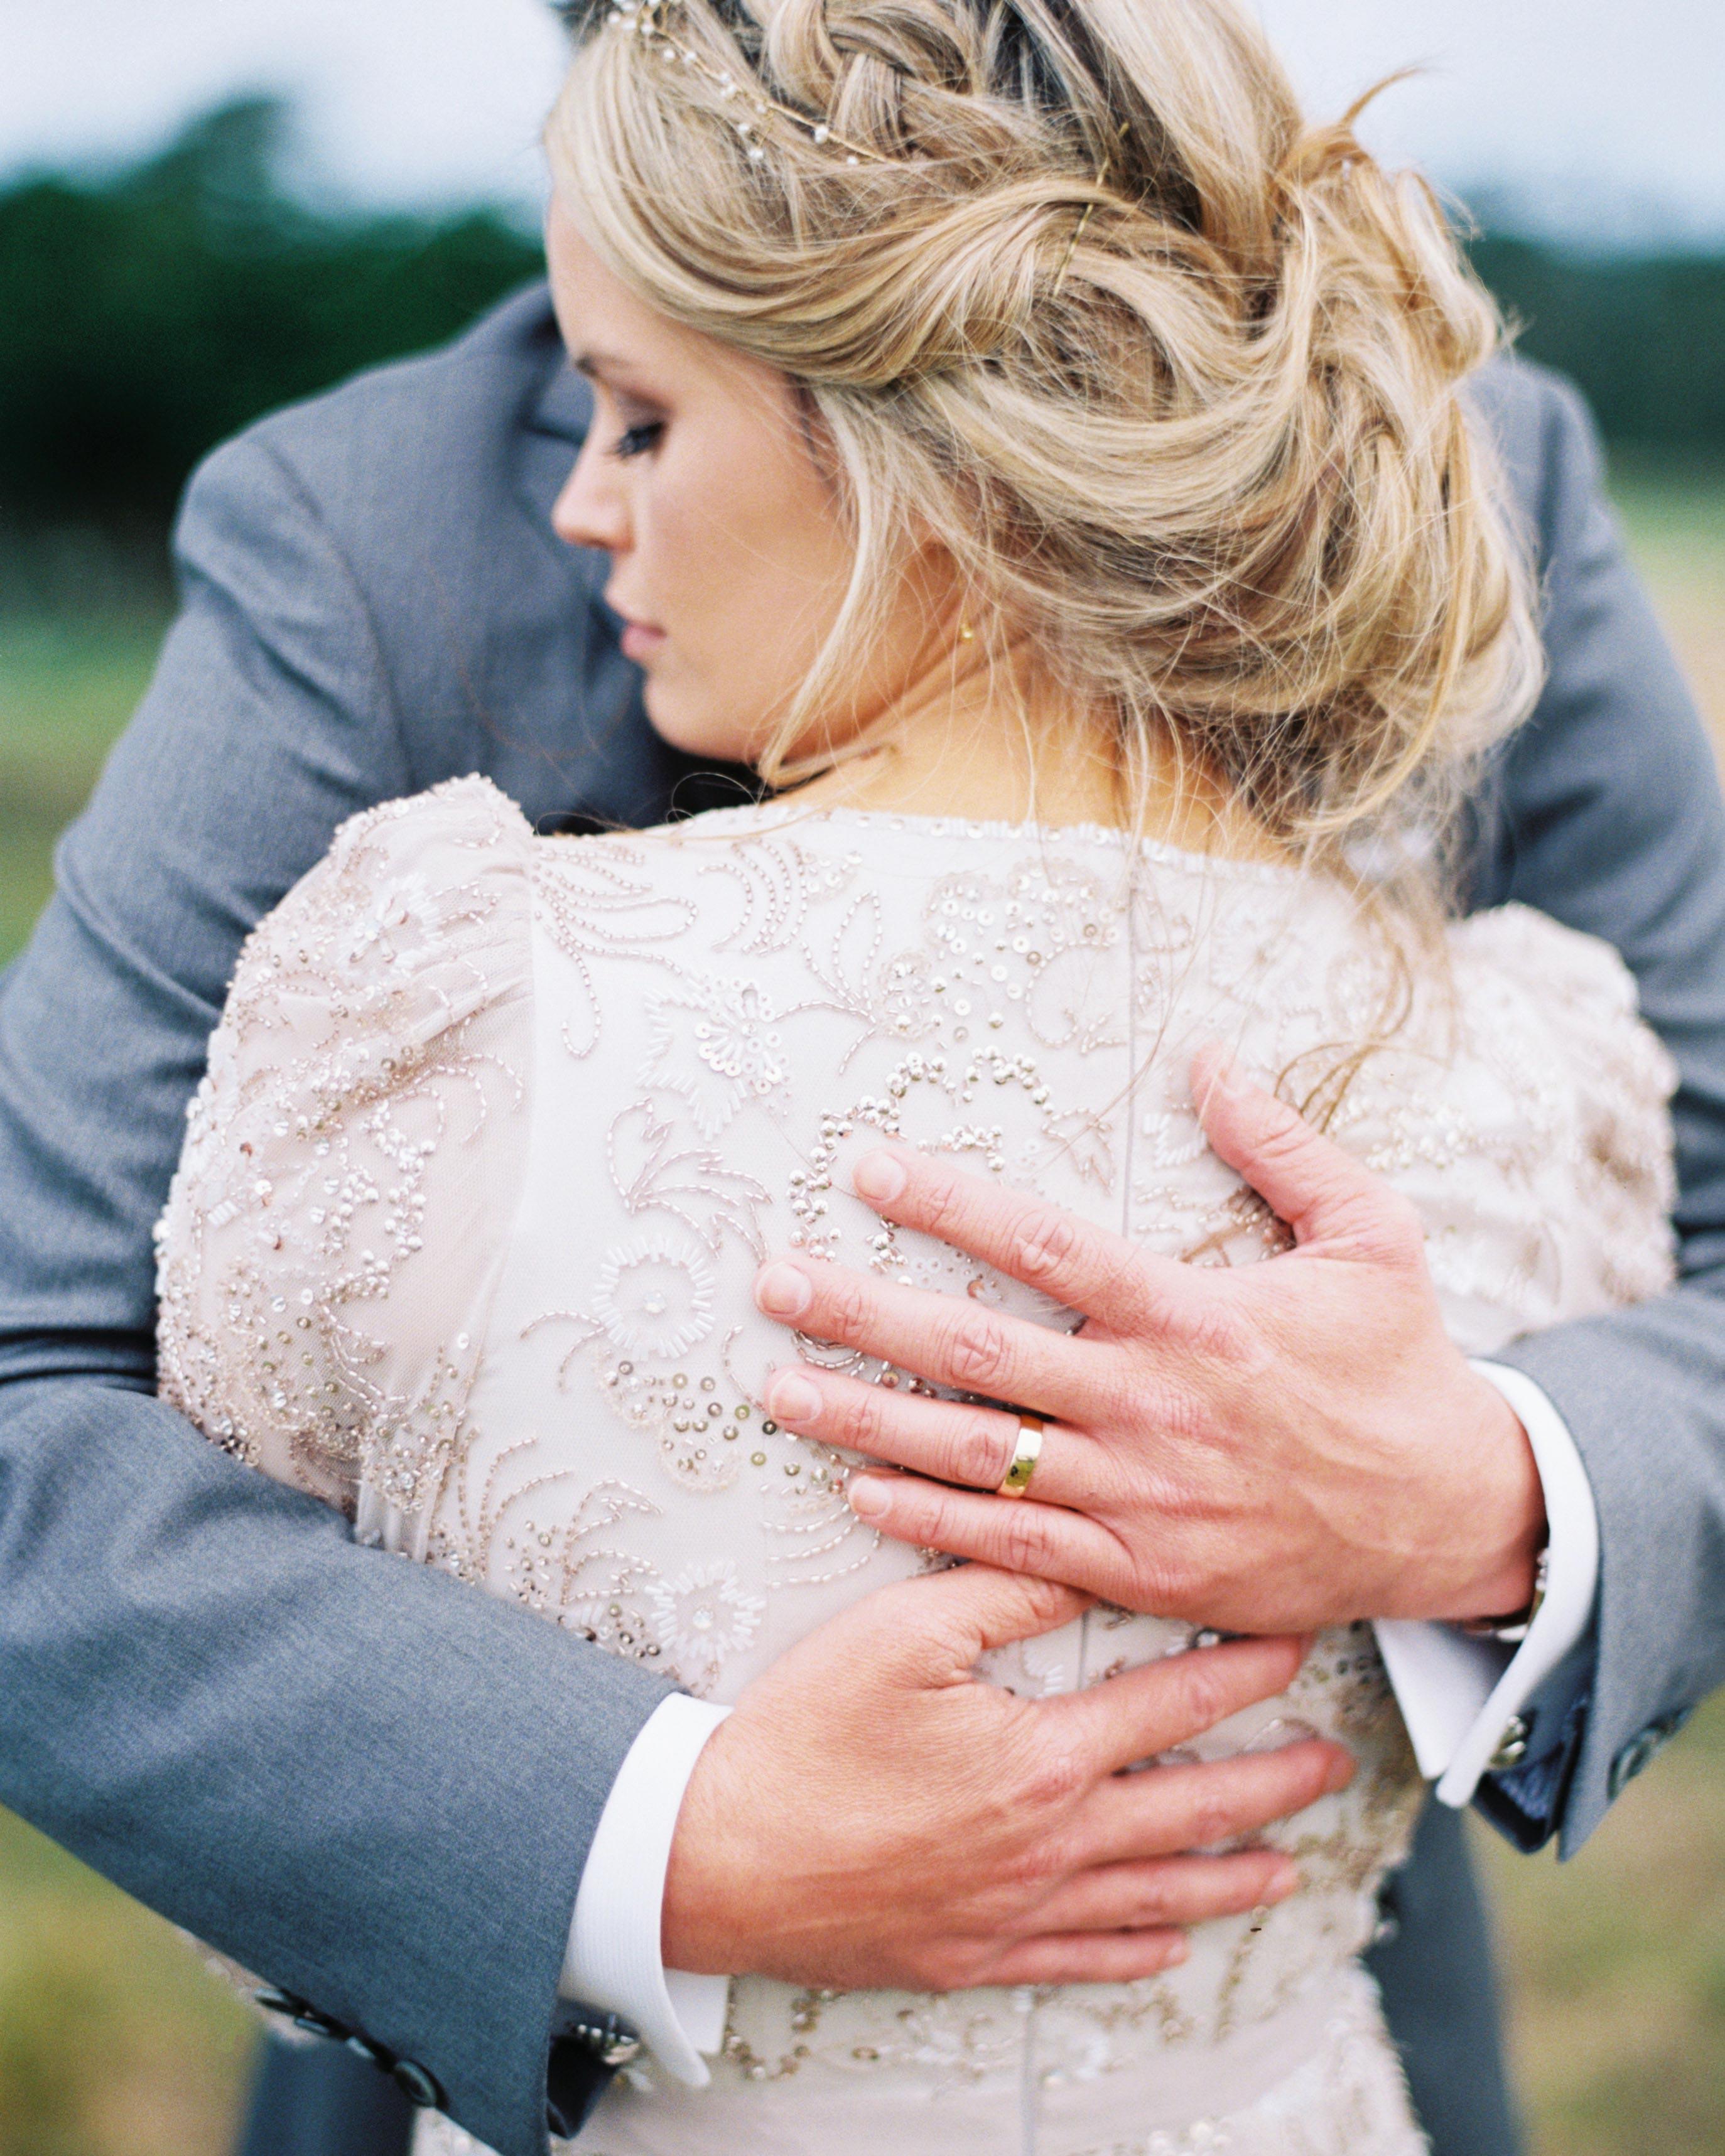 ginny-andrew-wedding-embrace-0791-s112676-0216.jpg